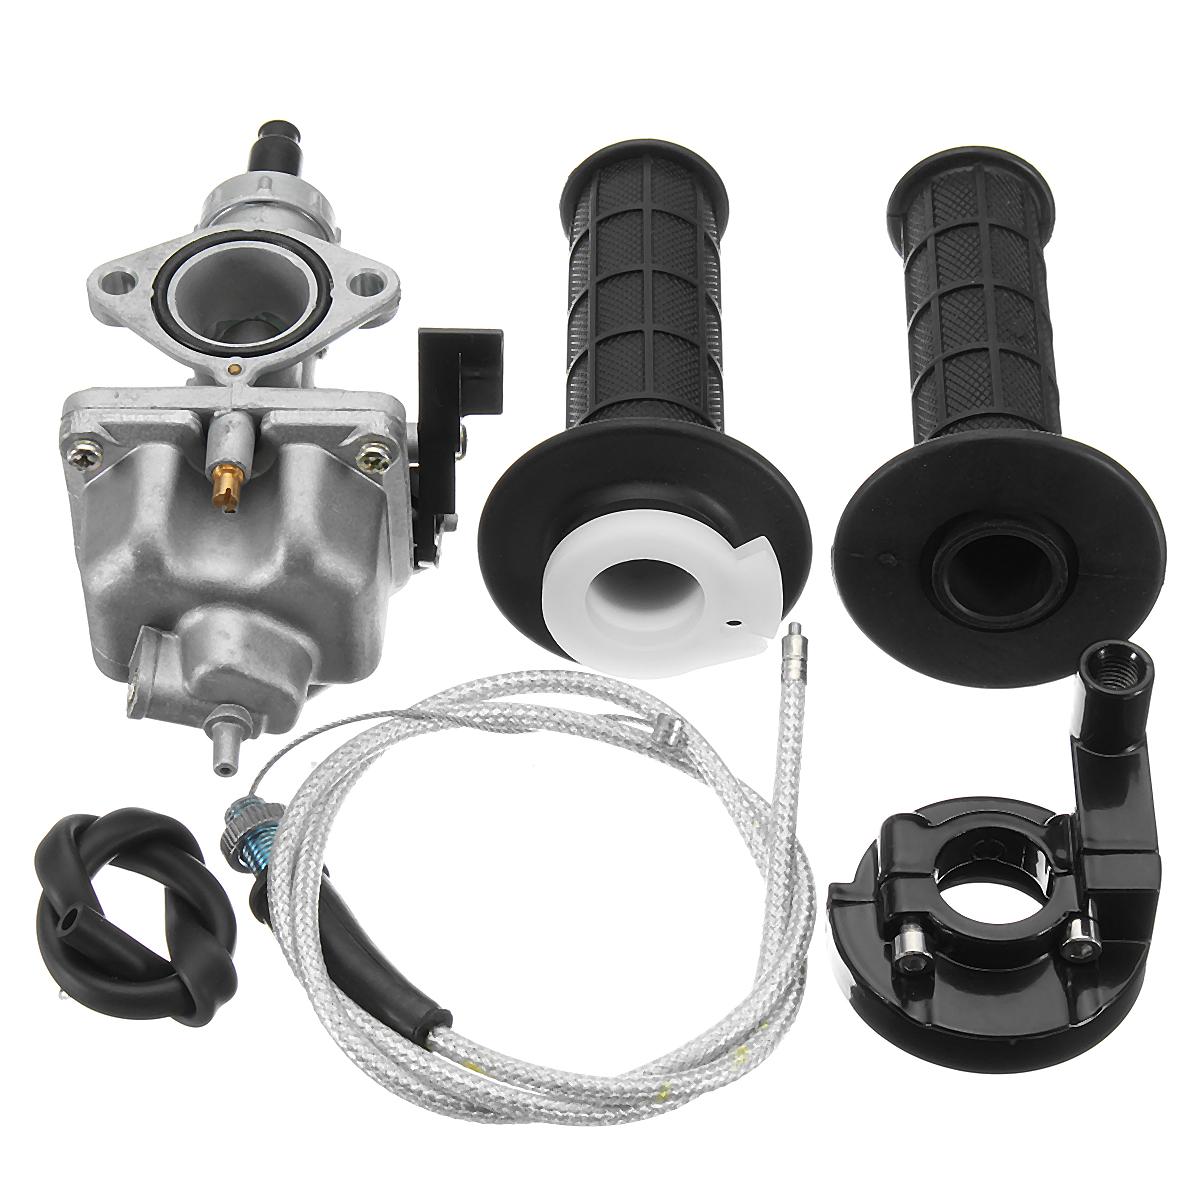 Handlebar Hand Grips Carburetor Throttle Cable For Honda XR100 XR100R CRF100F